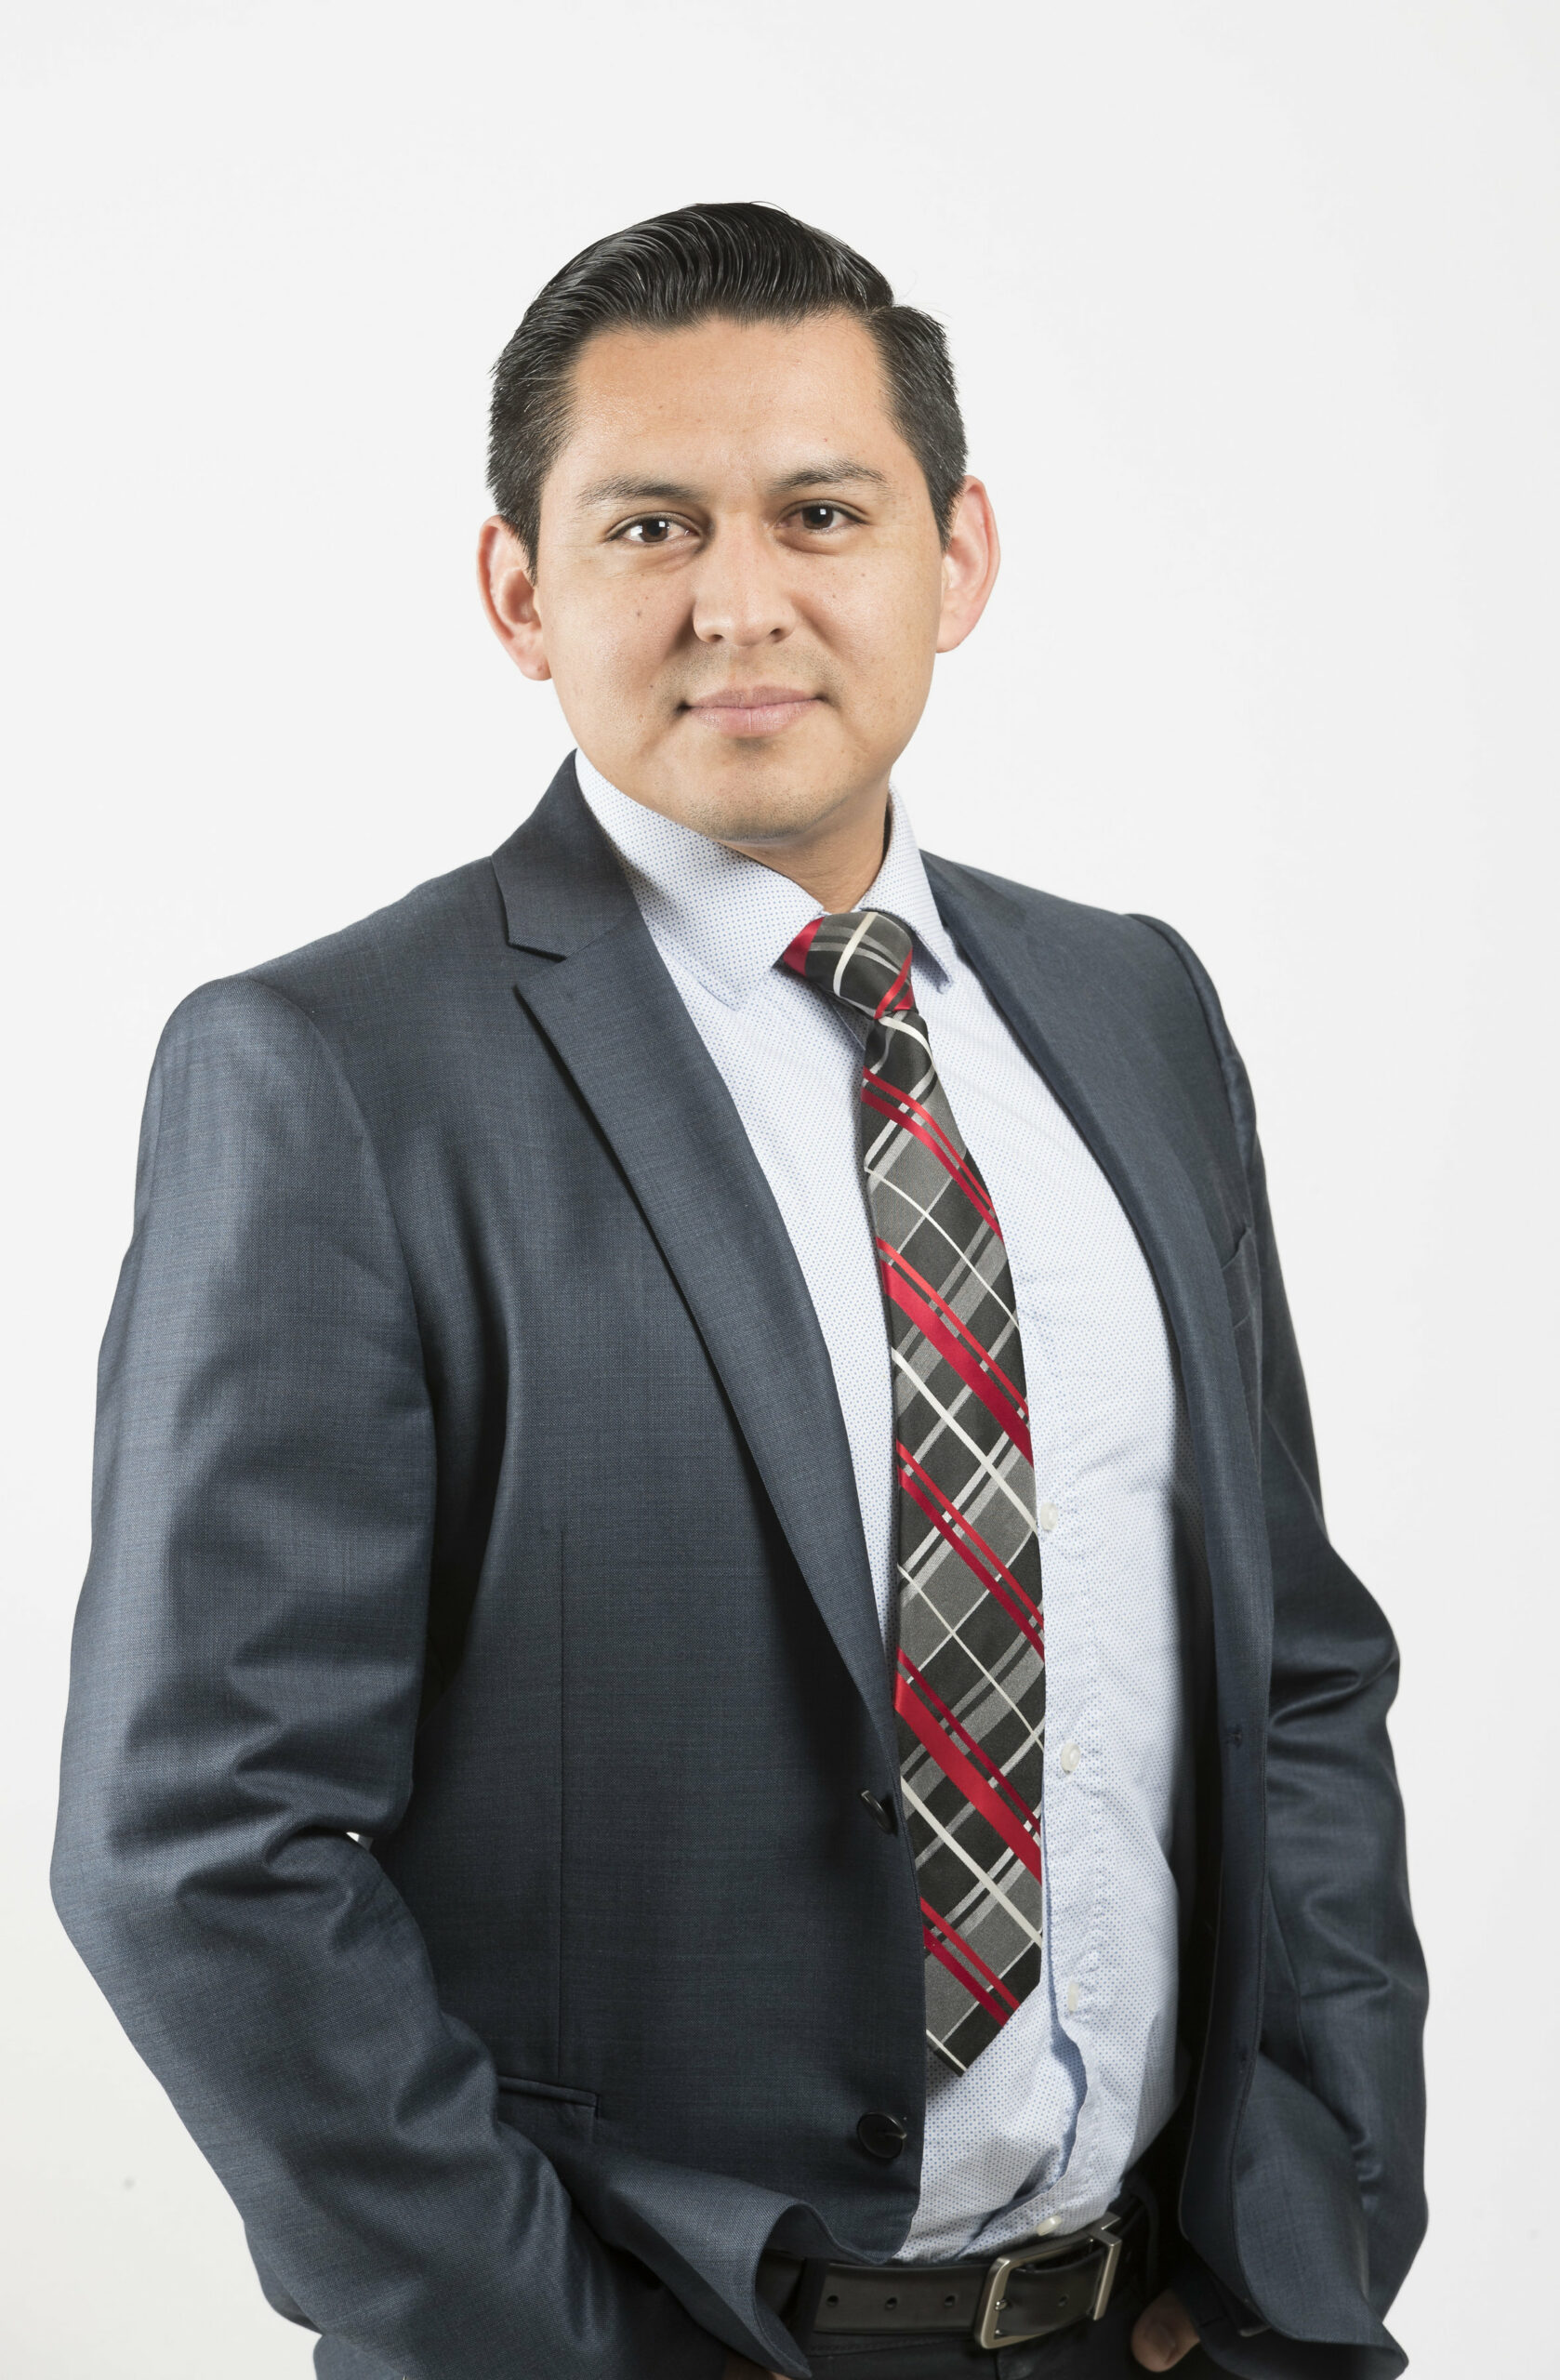 Esteban Santamaría Hernández